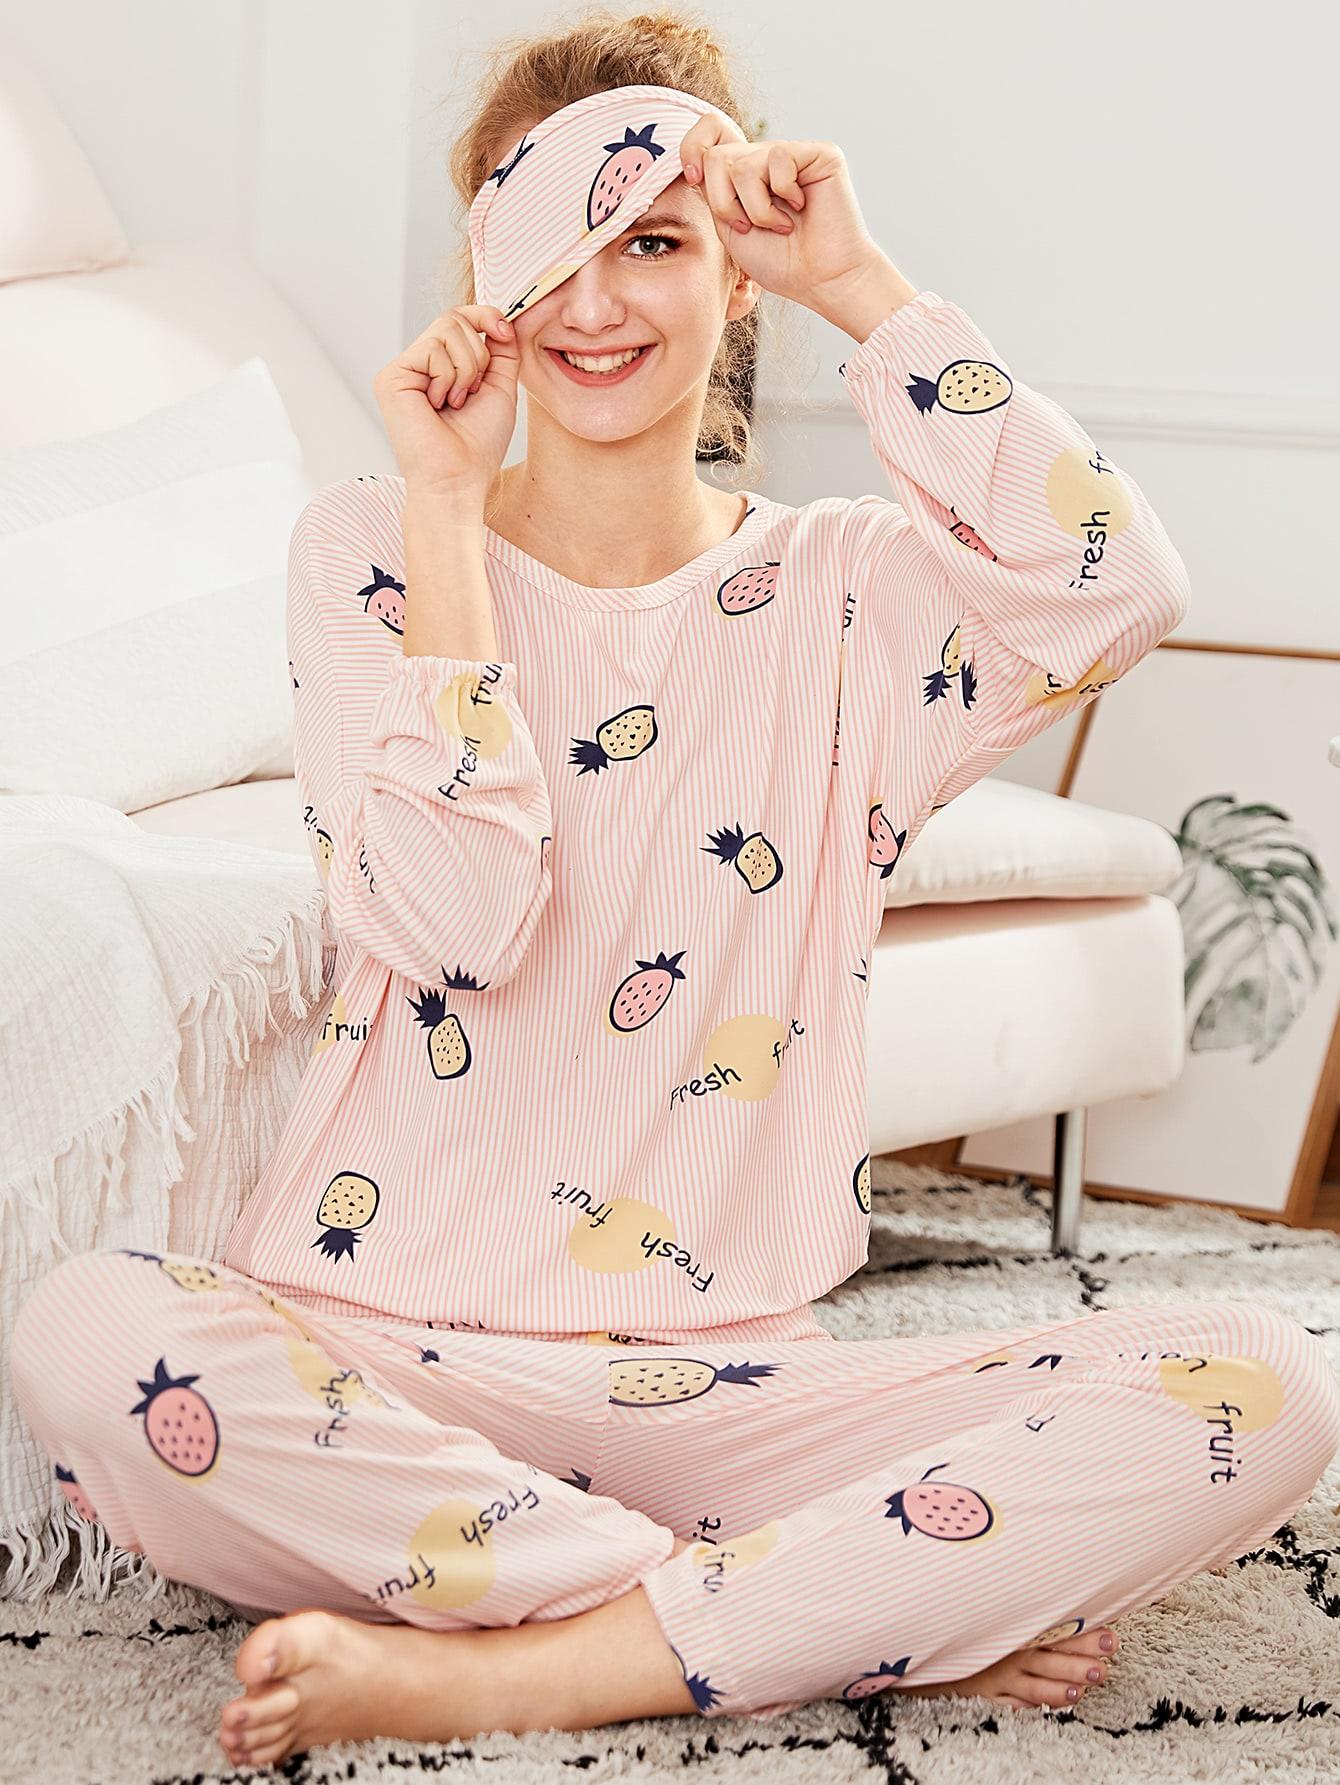 Pineapple Print Pajama Set With Eye Mask набор форм для выпечки кекса кварц средняя диаметр 9 5 см